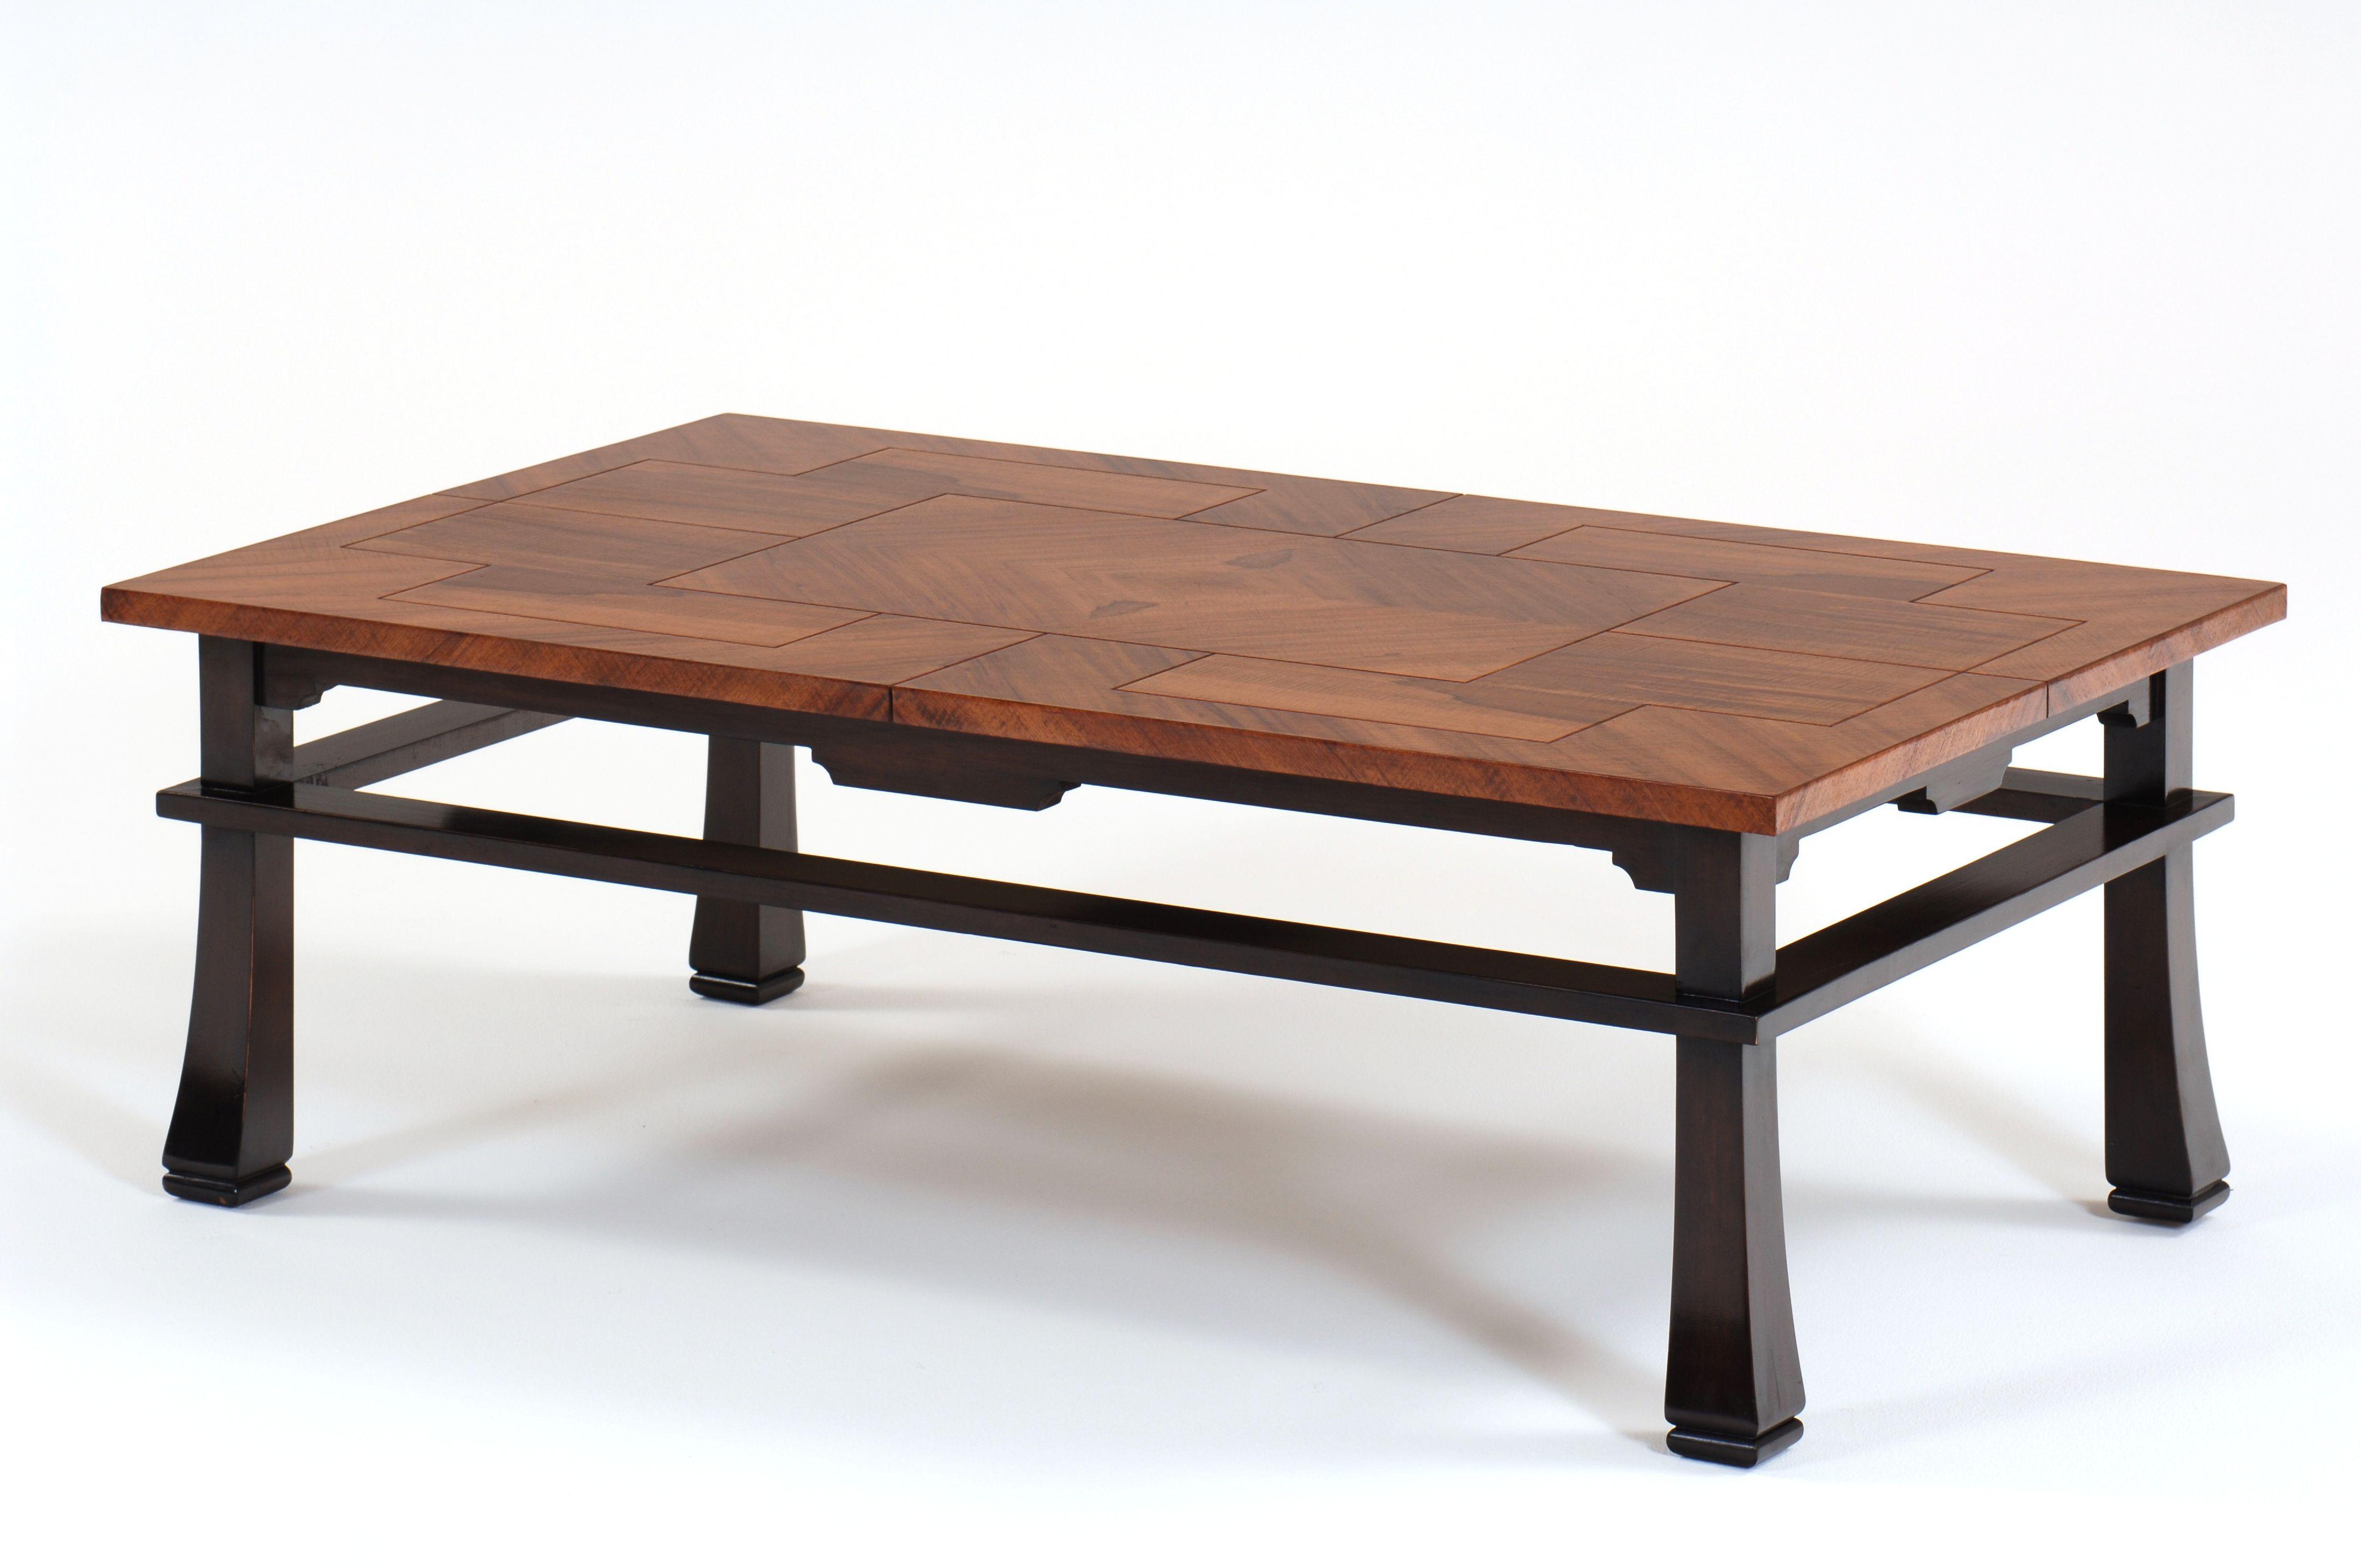 Tesori Designs 203 Shinto Table Pieces Of Rare Koa Wood Exquisitely Assembled In A Segmented Design Create A Ba Custom Furniture Furniture Bespoke Furniture [ 2848 x 4288 Pixel ]